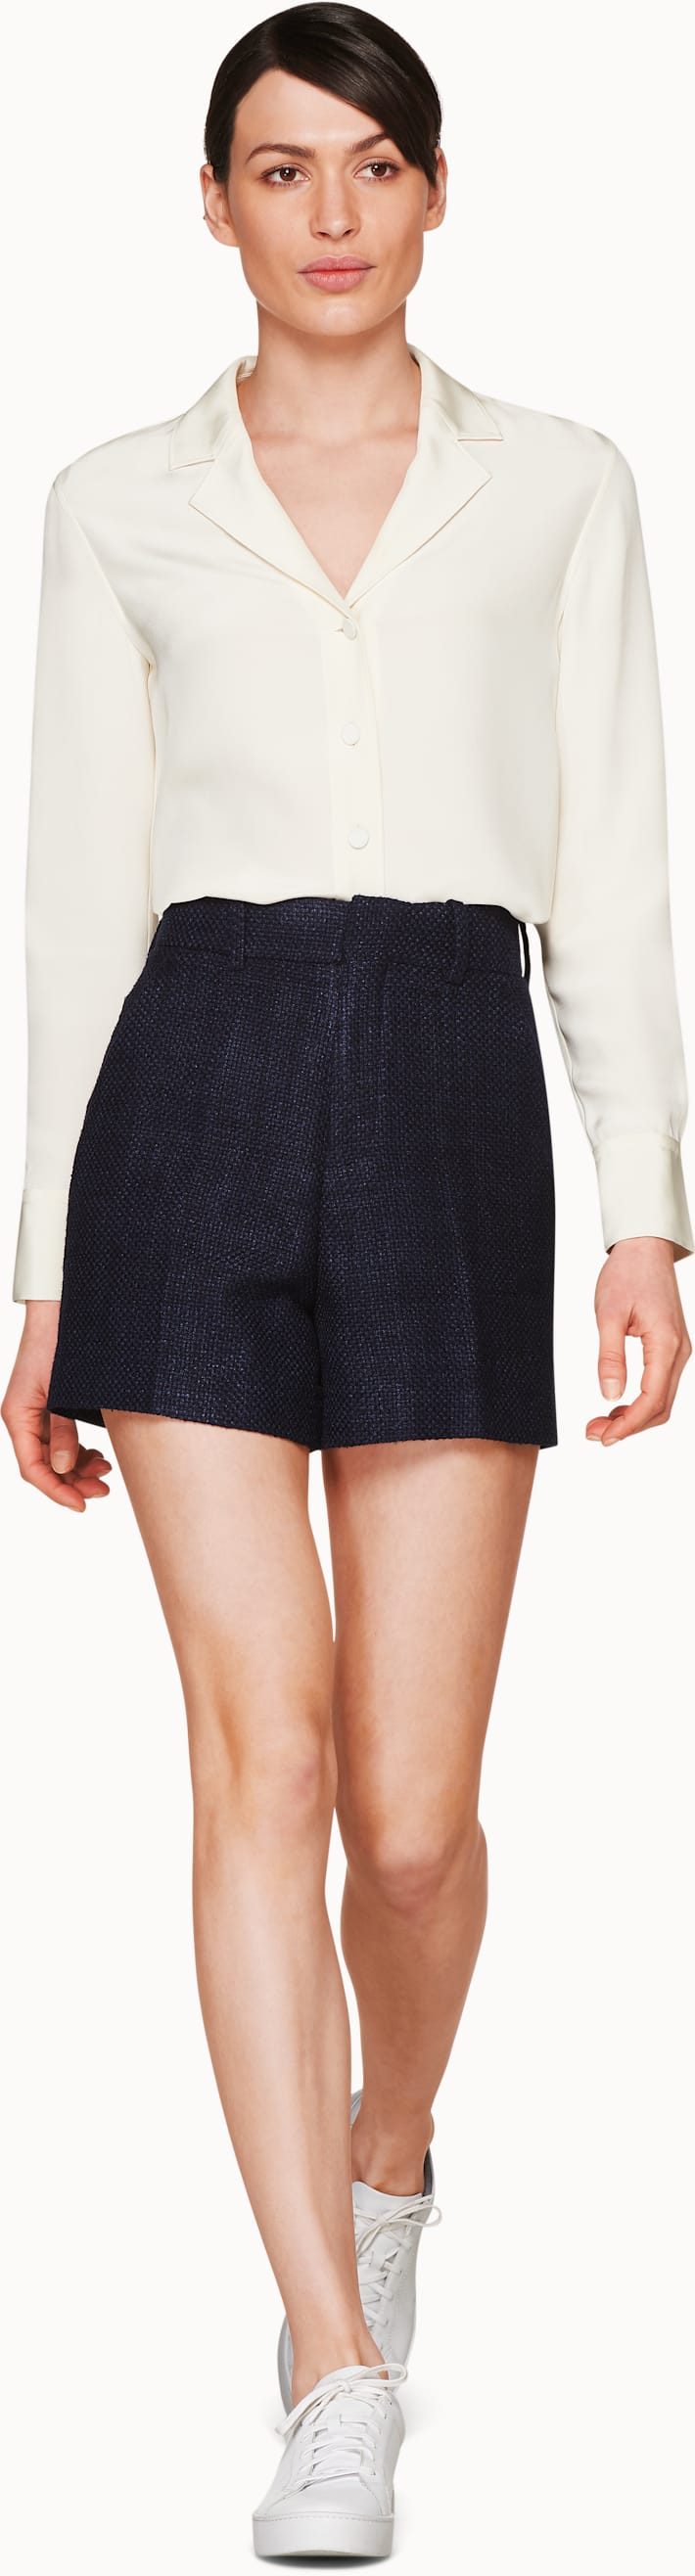 Nylah Navy  Trousers